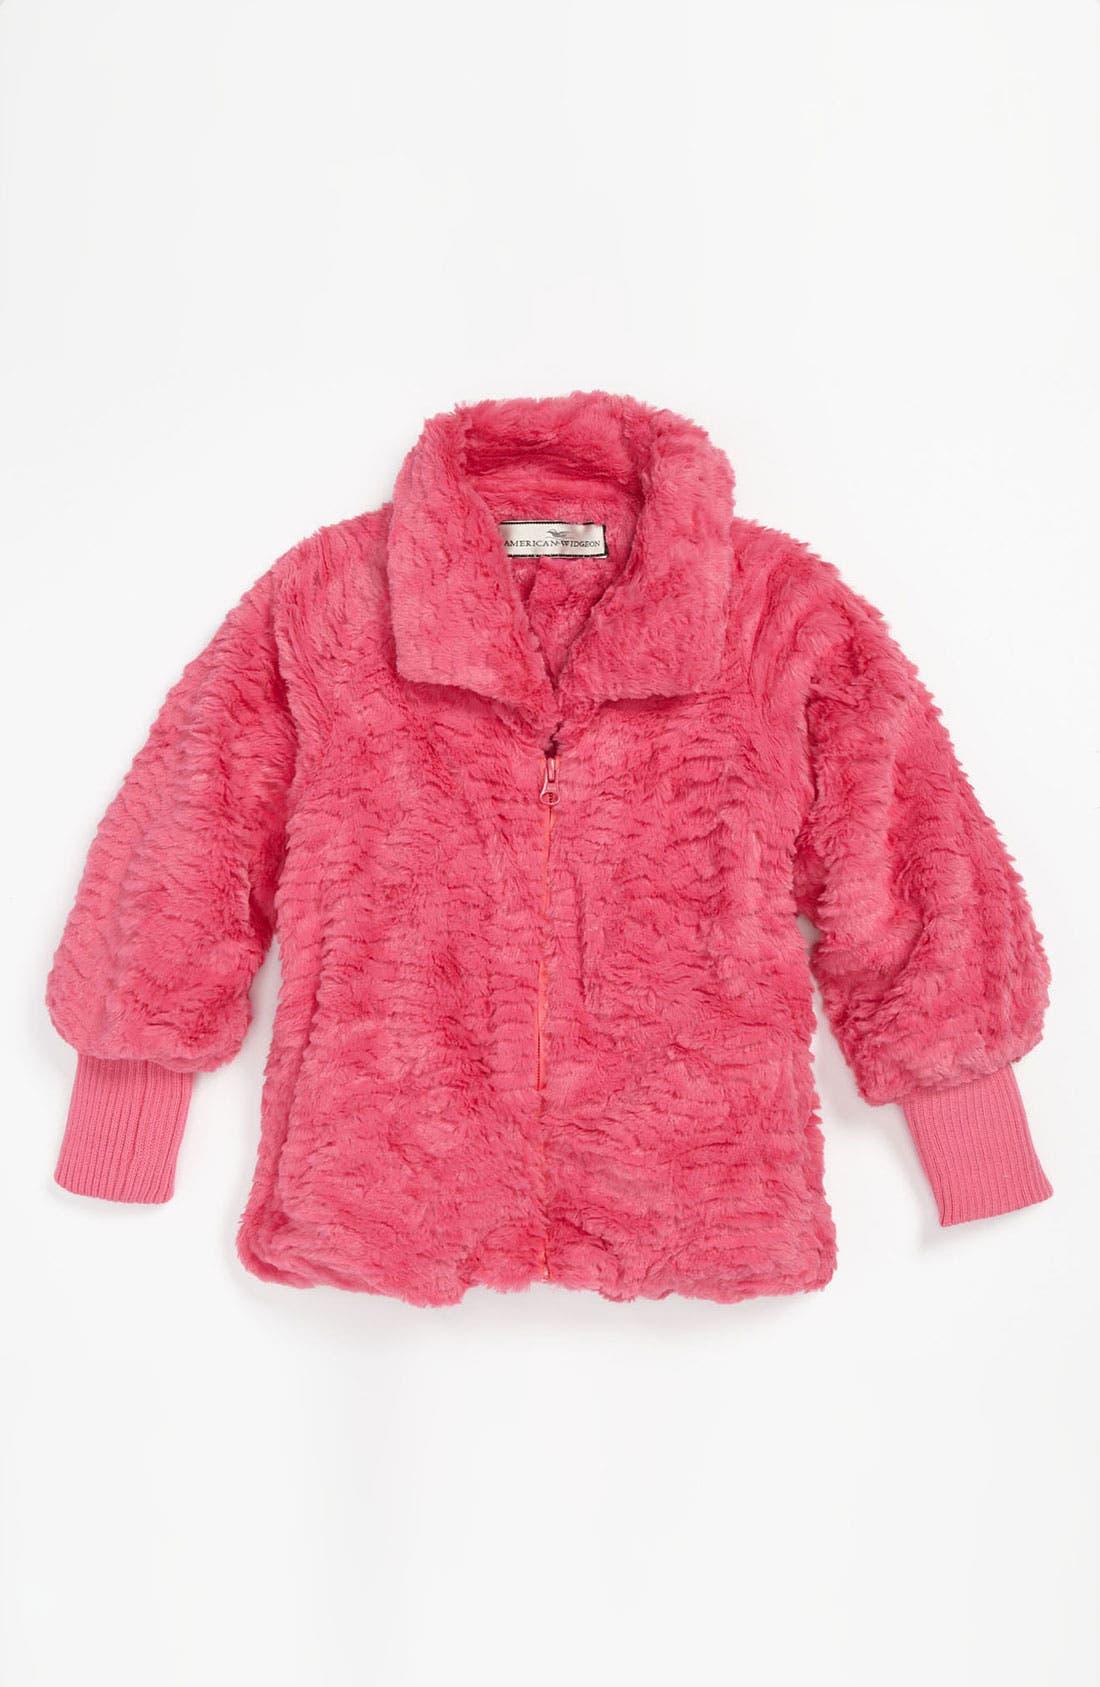 Alternate Image 1 Selected - Widgeon Faux Fur Jacket (Little Girls)